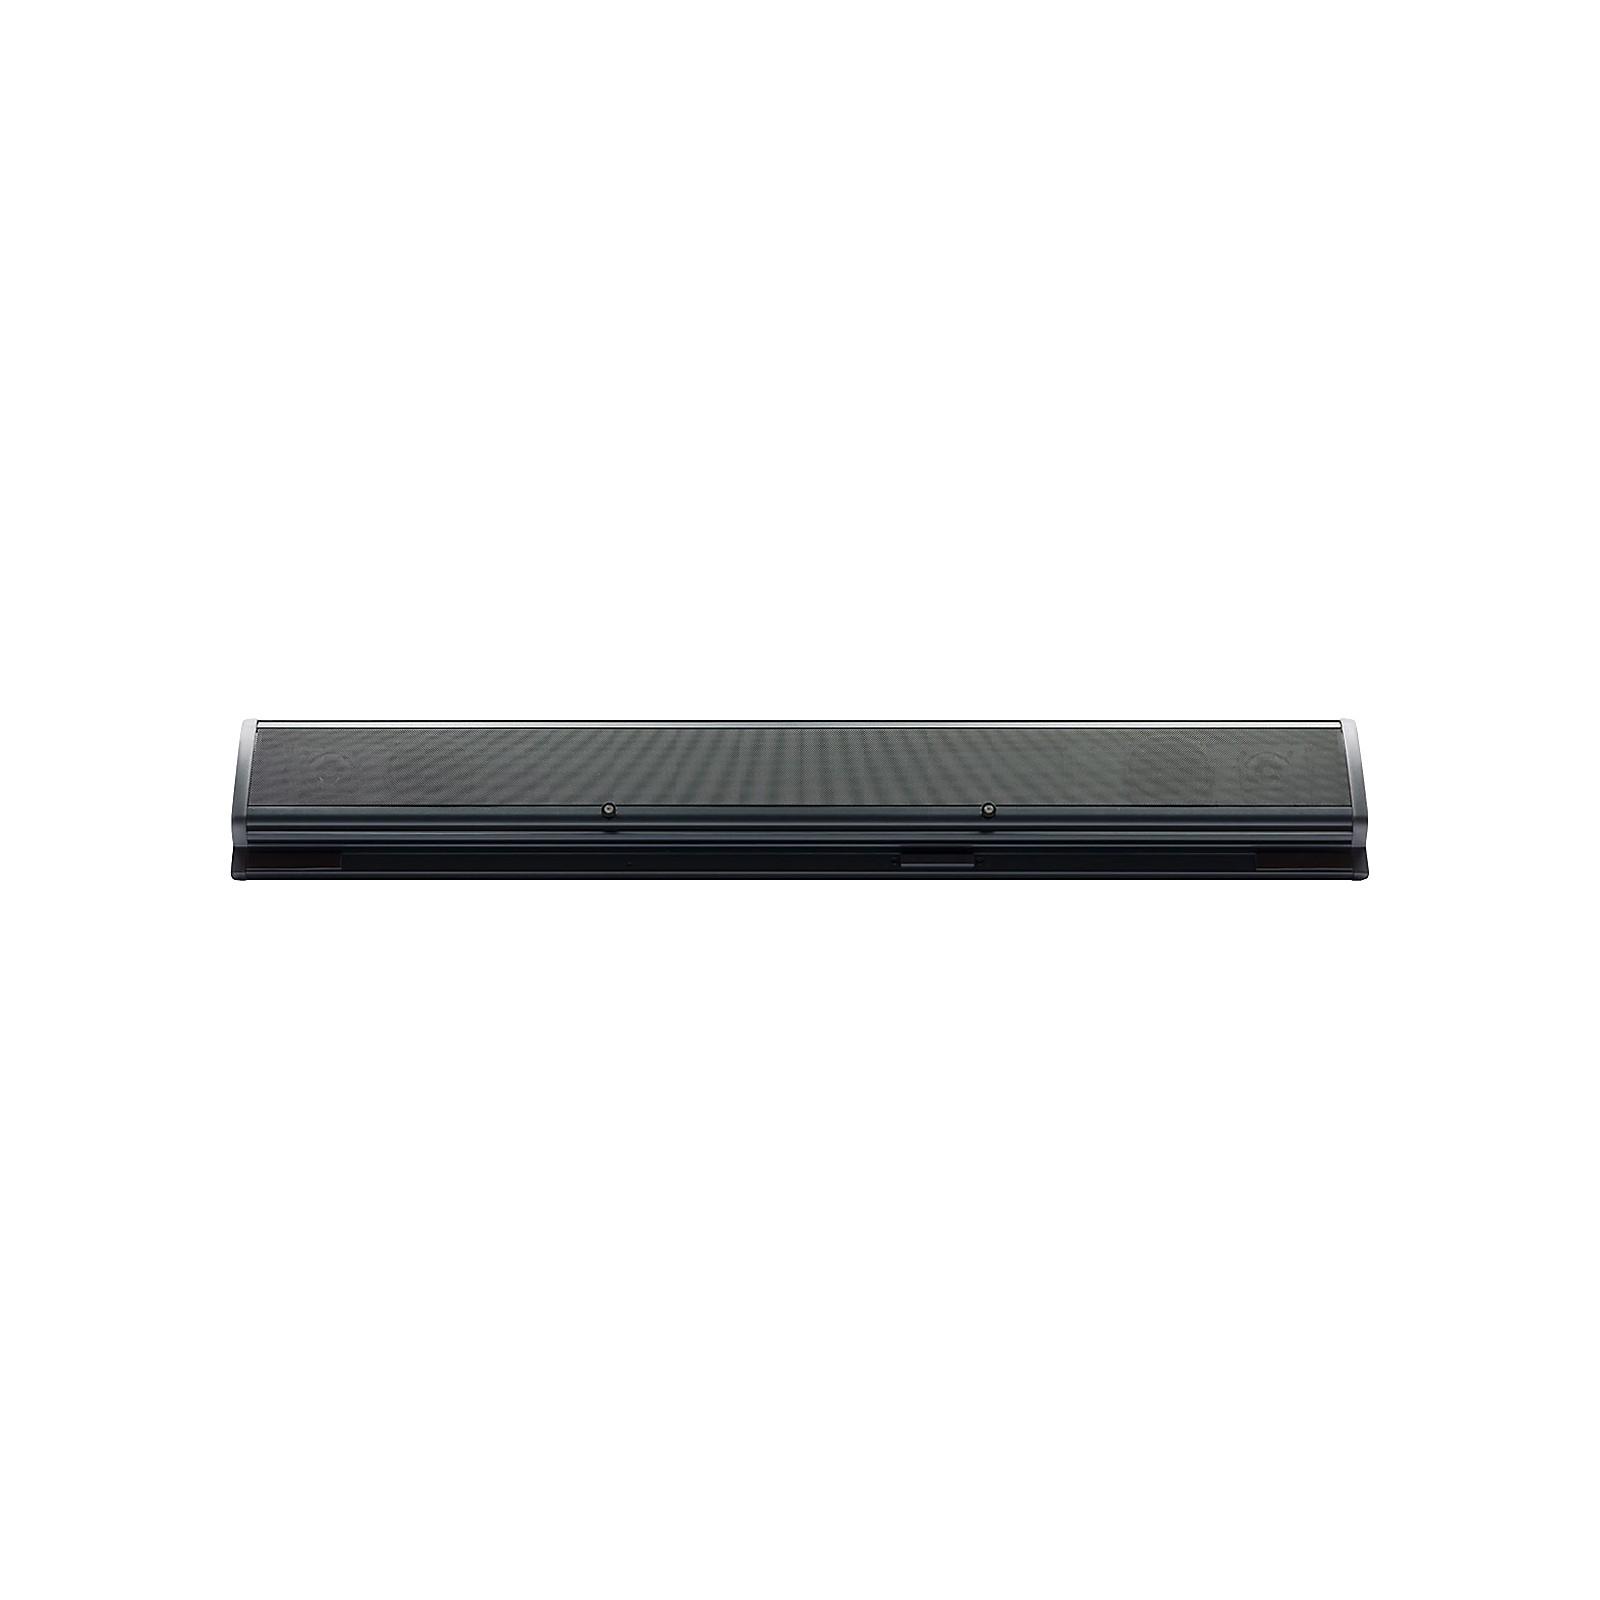 Open Box Korg PaAS Optional Speaker System for Pa Series